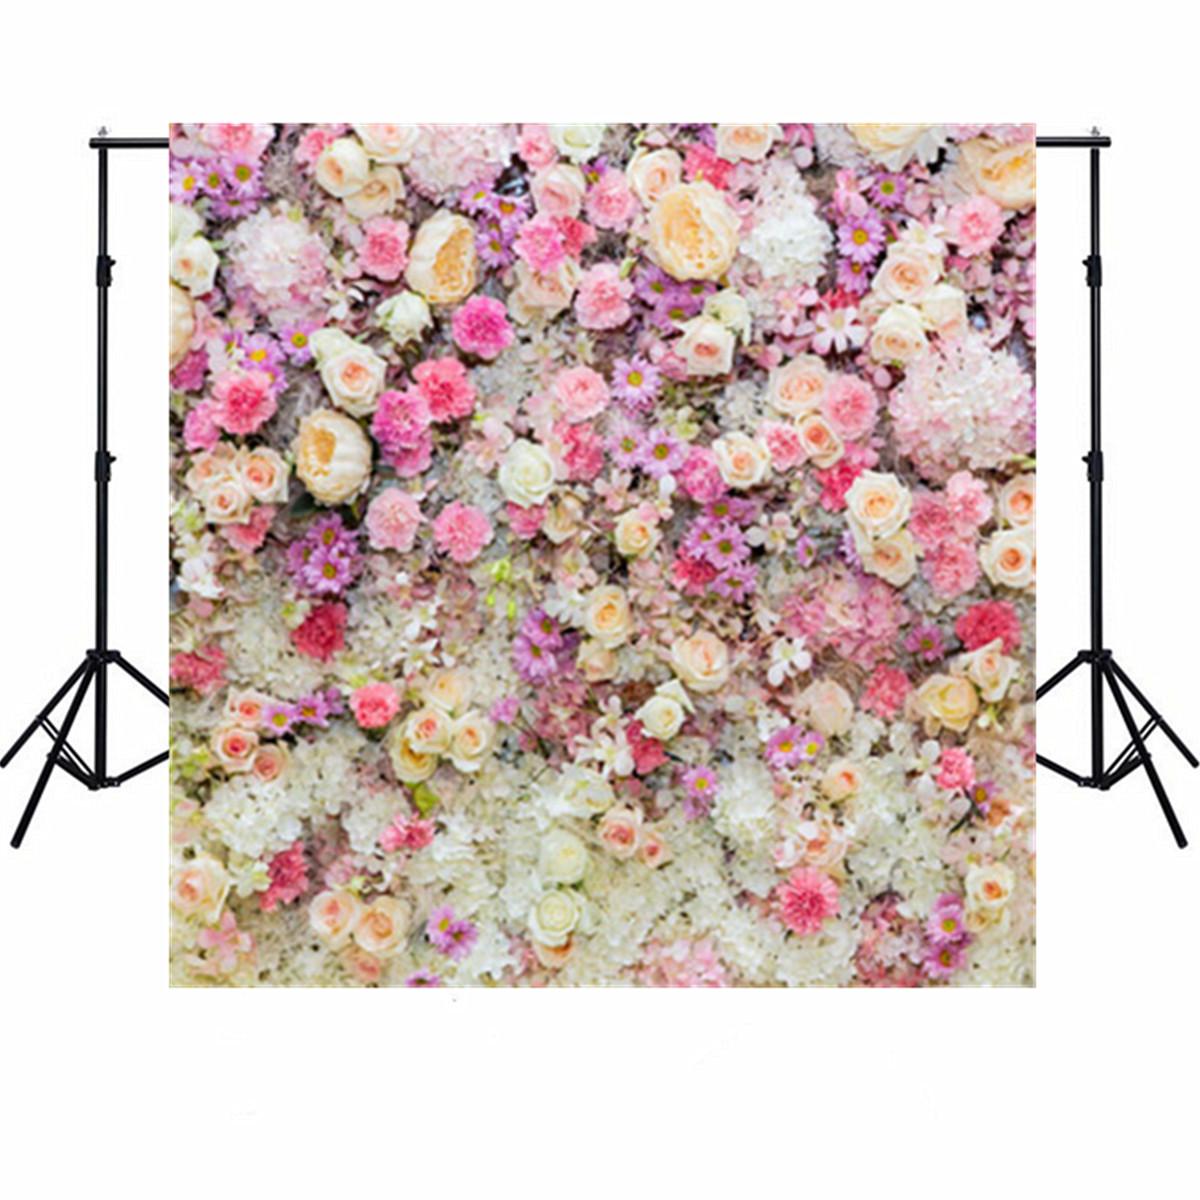 5x5FT Vinyl Valentine's Day Love Flowe Blossom Photo Studio Backdrop Photography Background